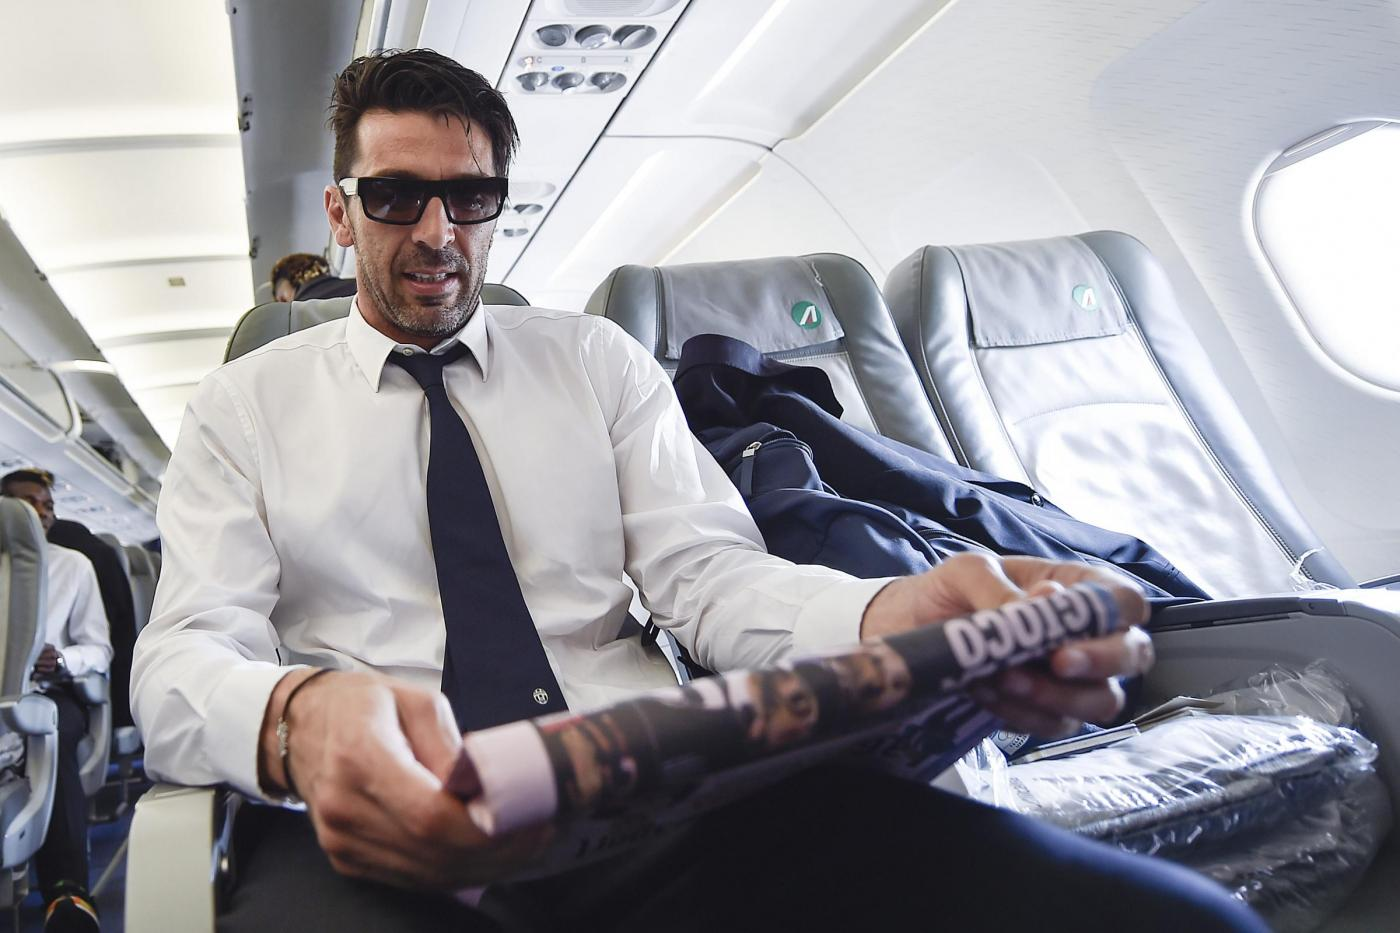 Gianluigi Buffon 2 luglio